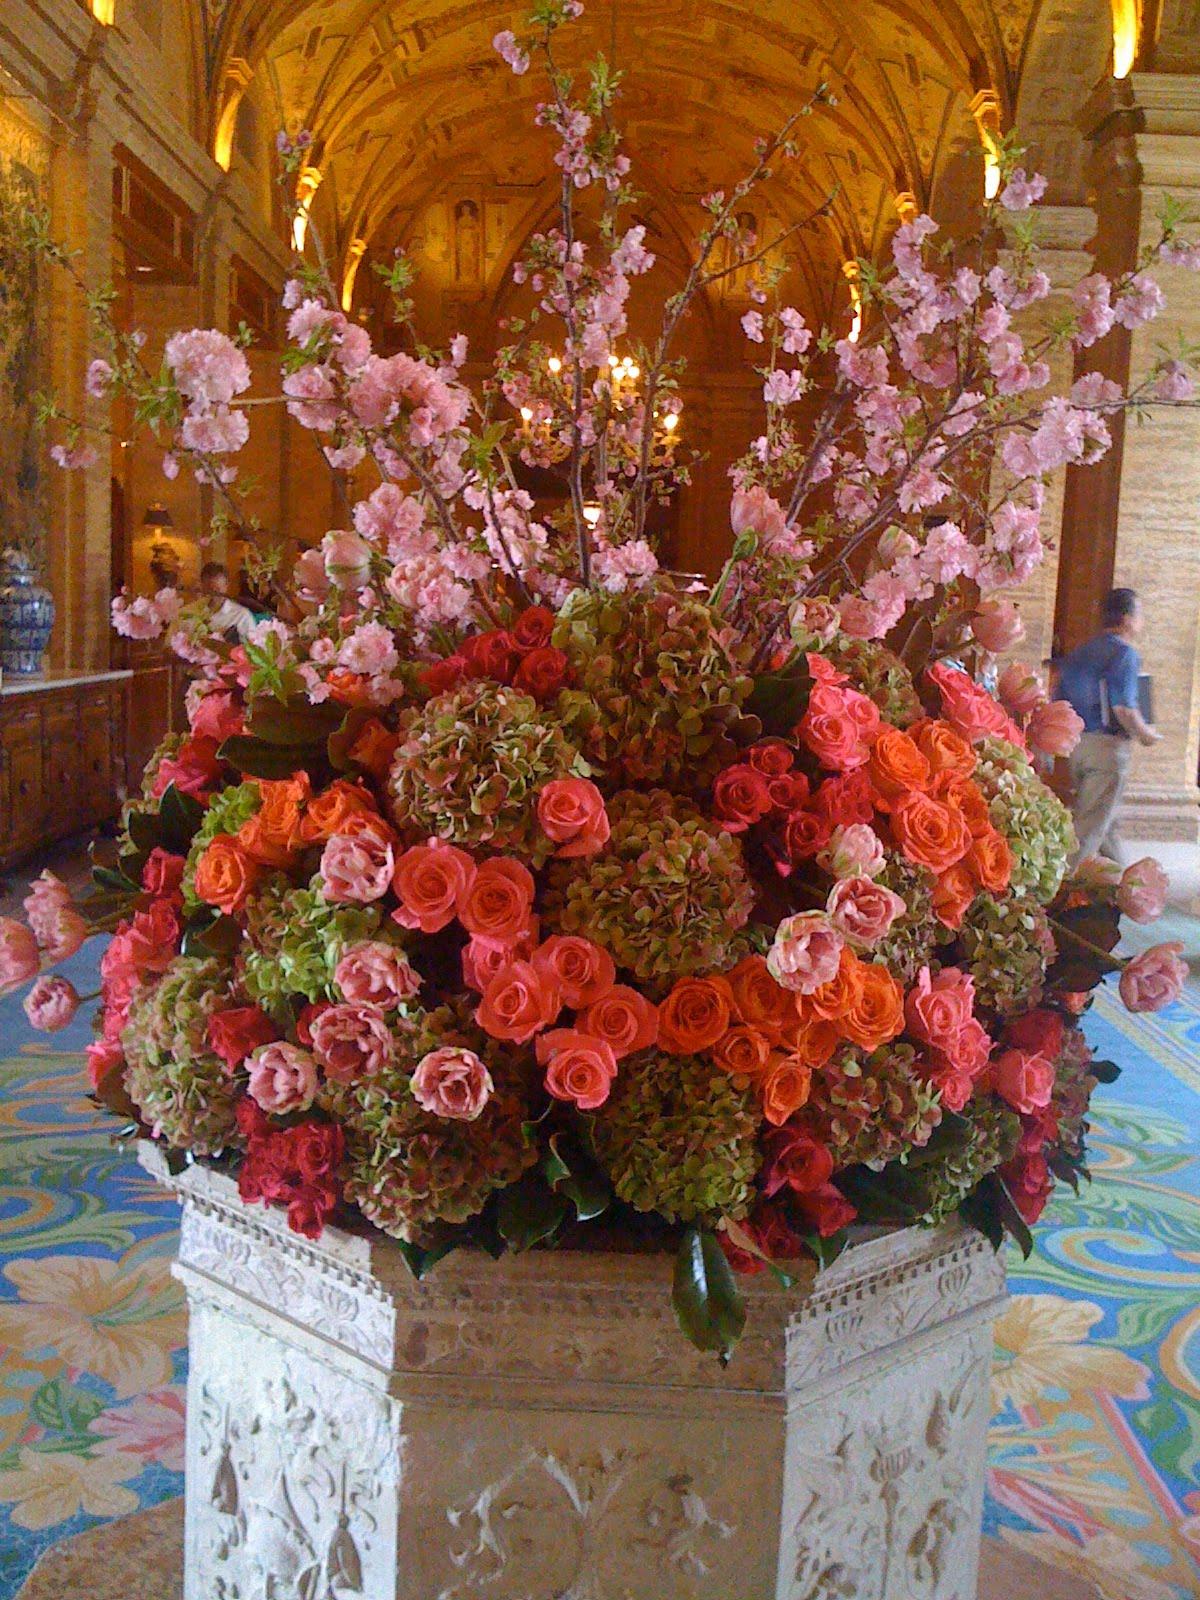 pink roses (along